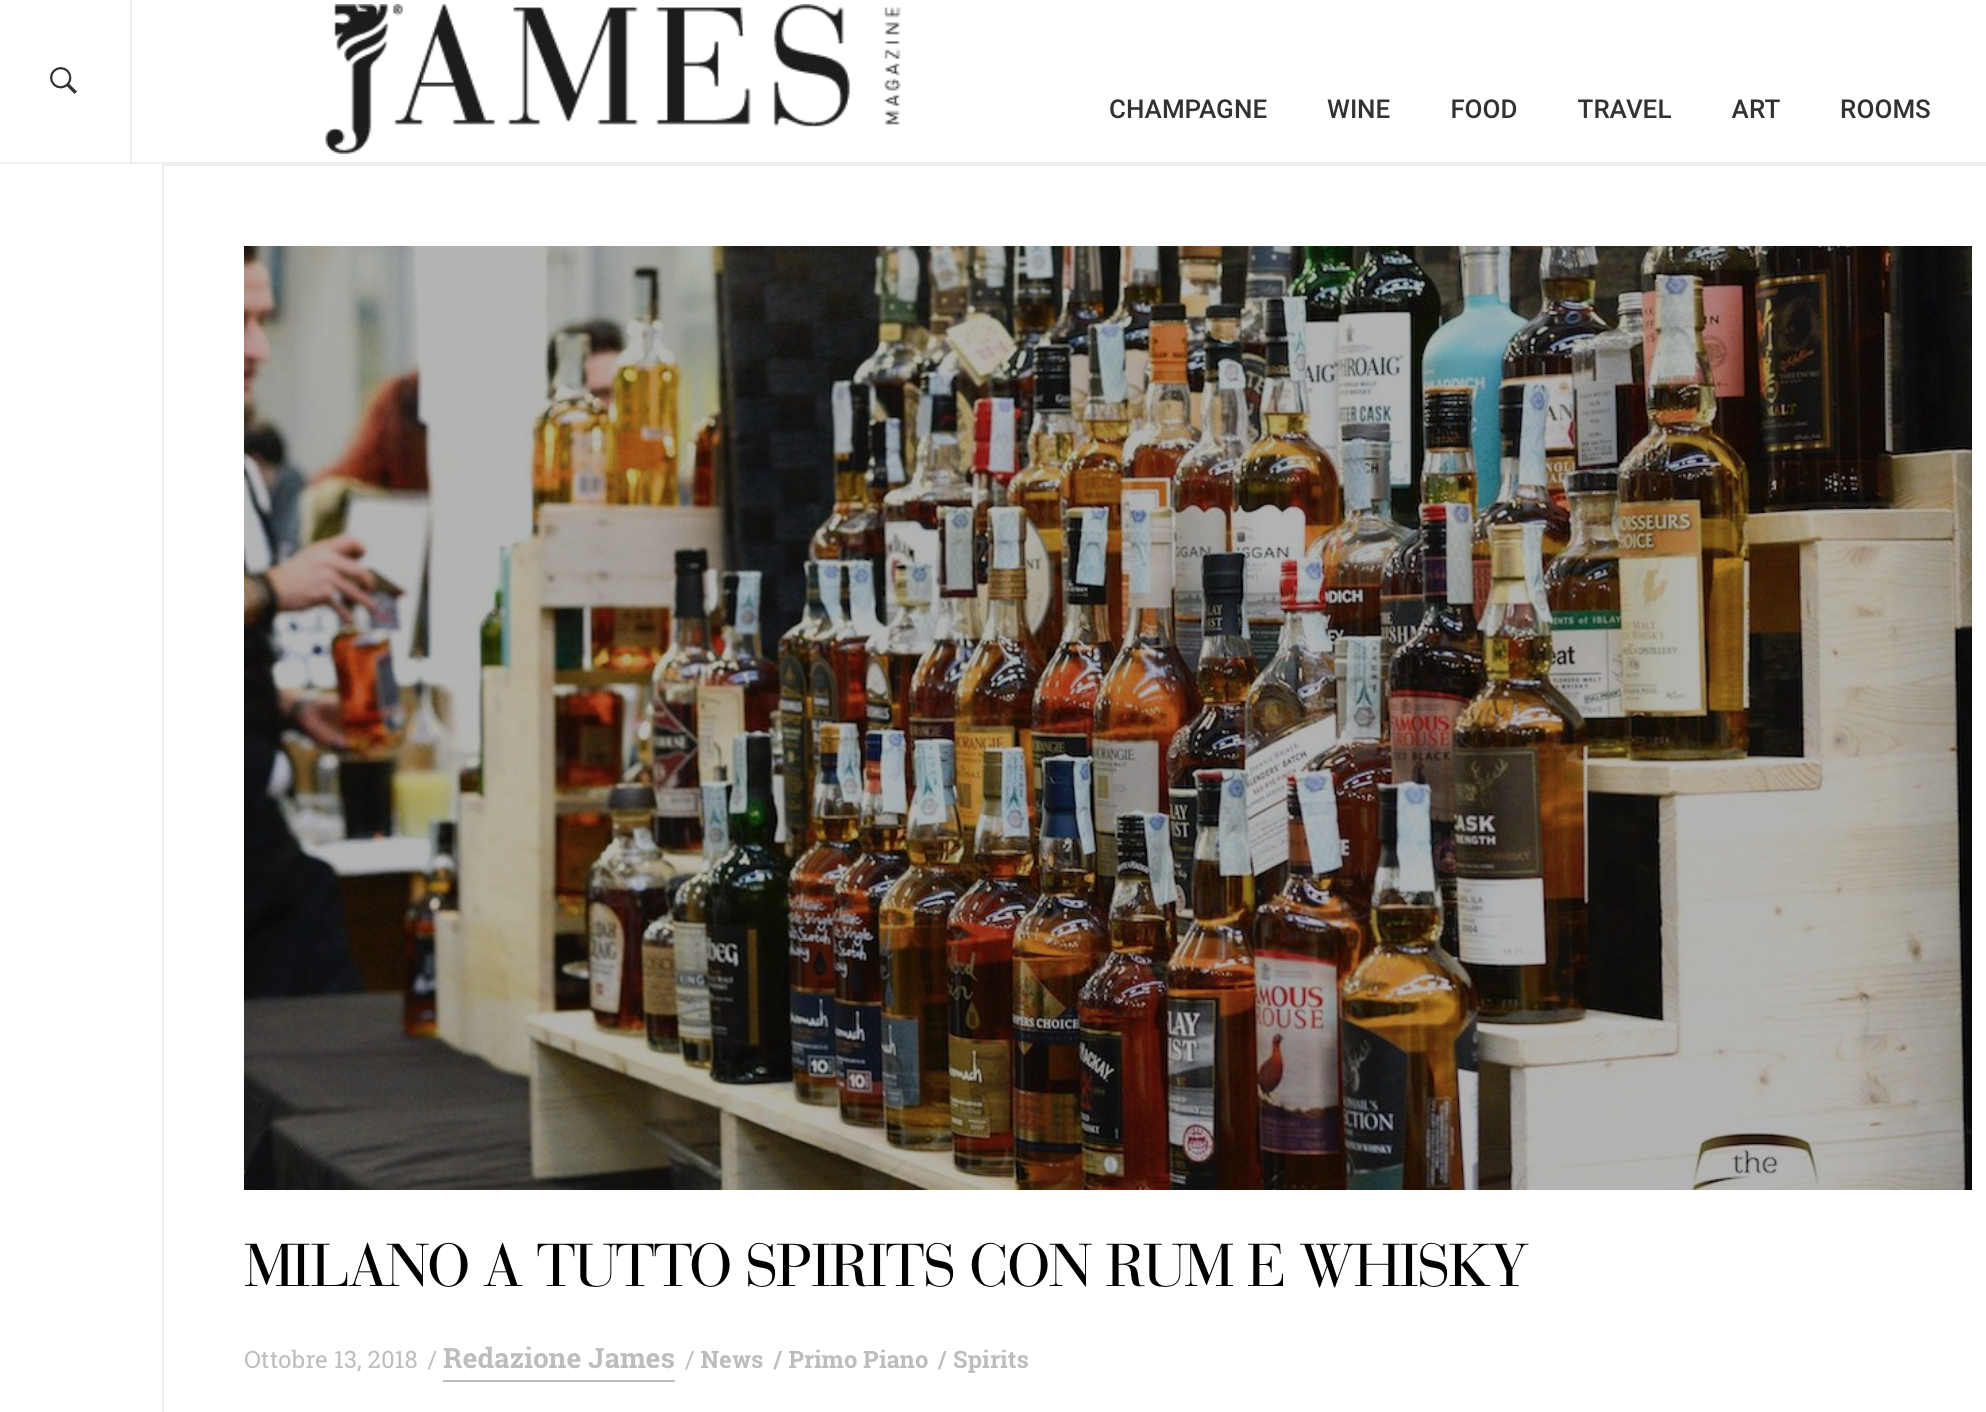 James -